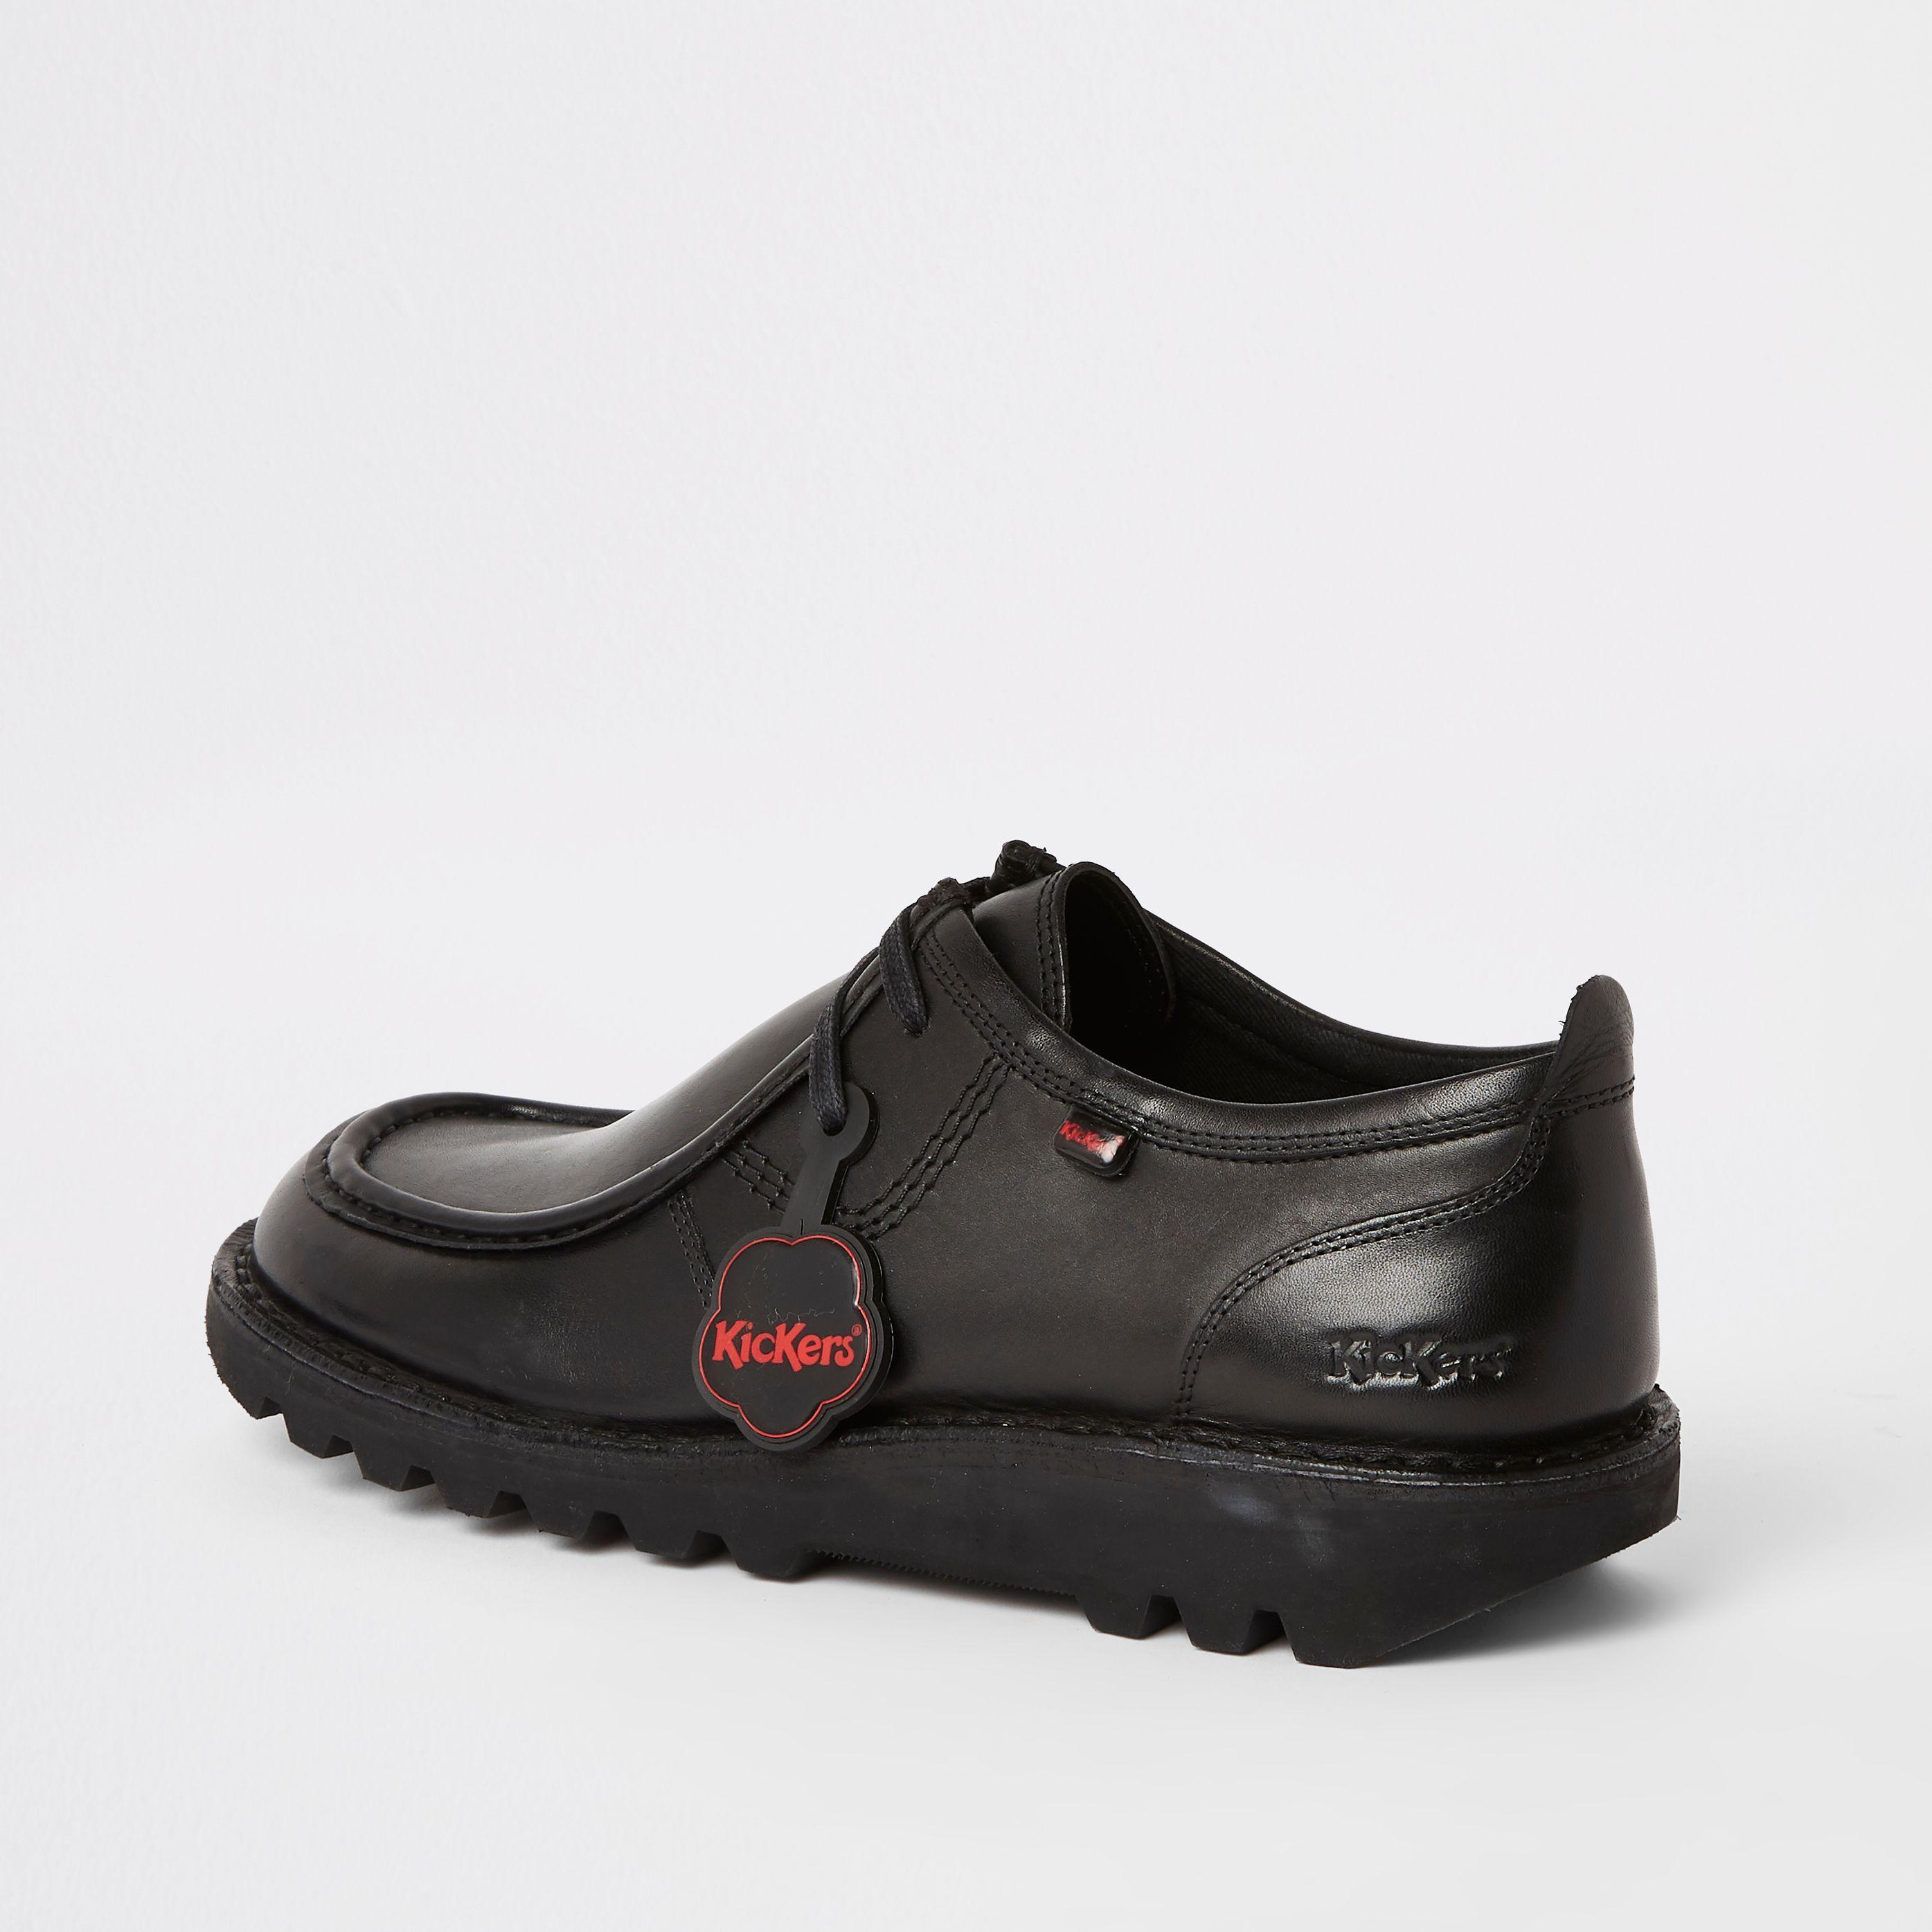 Mens River Island Kickers Black leather